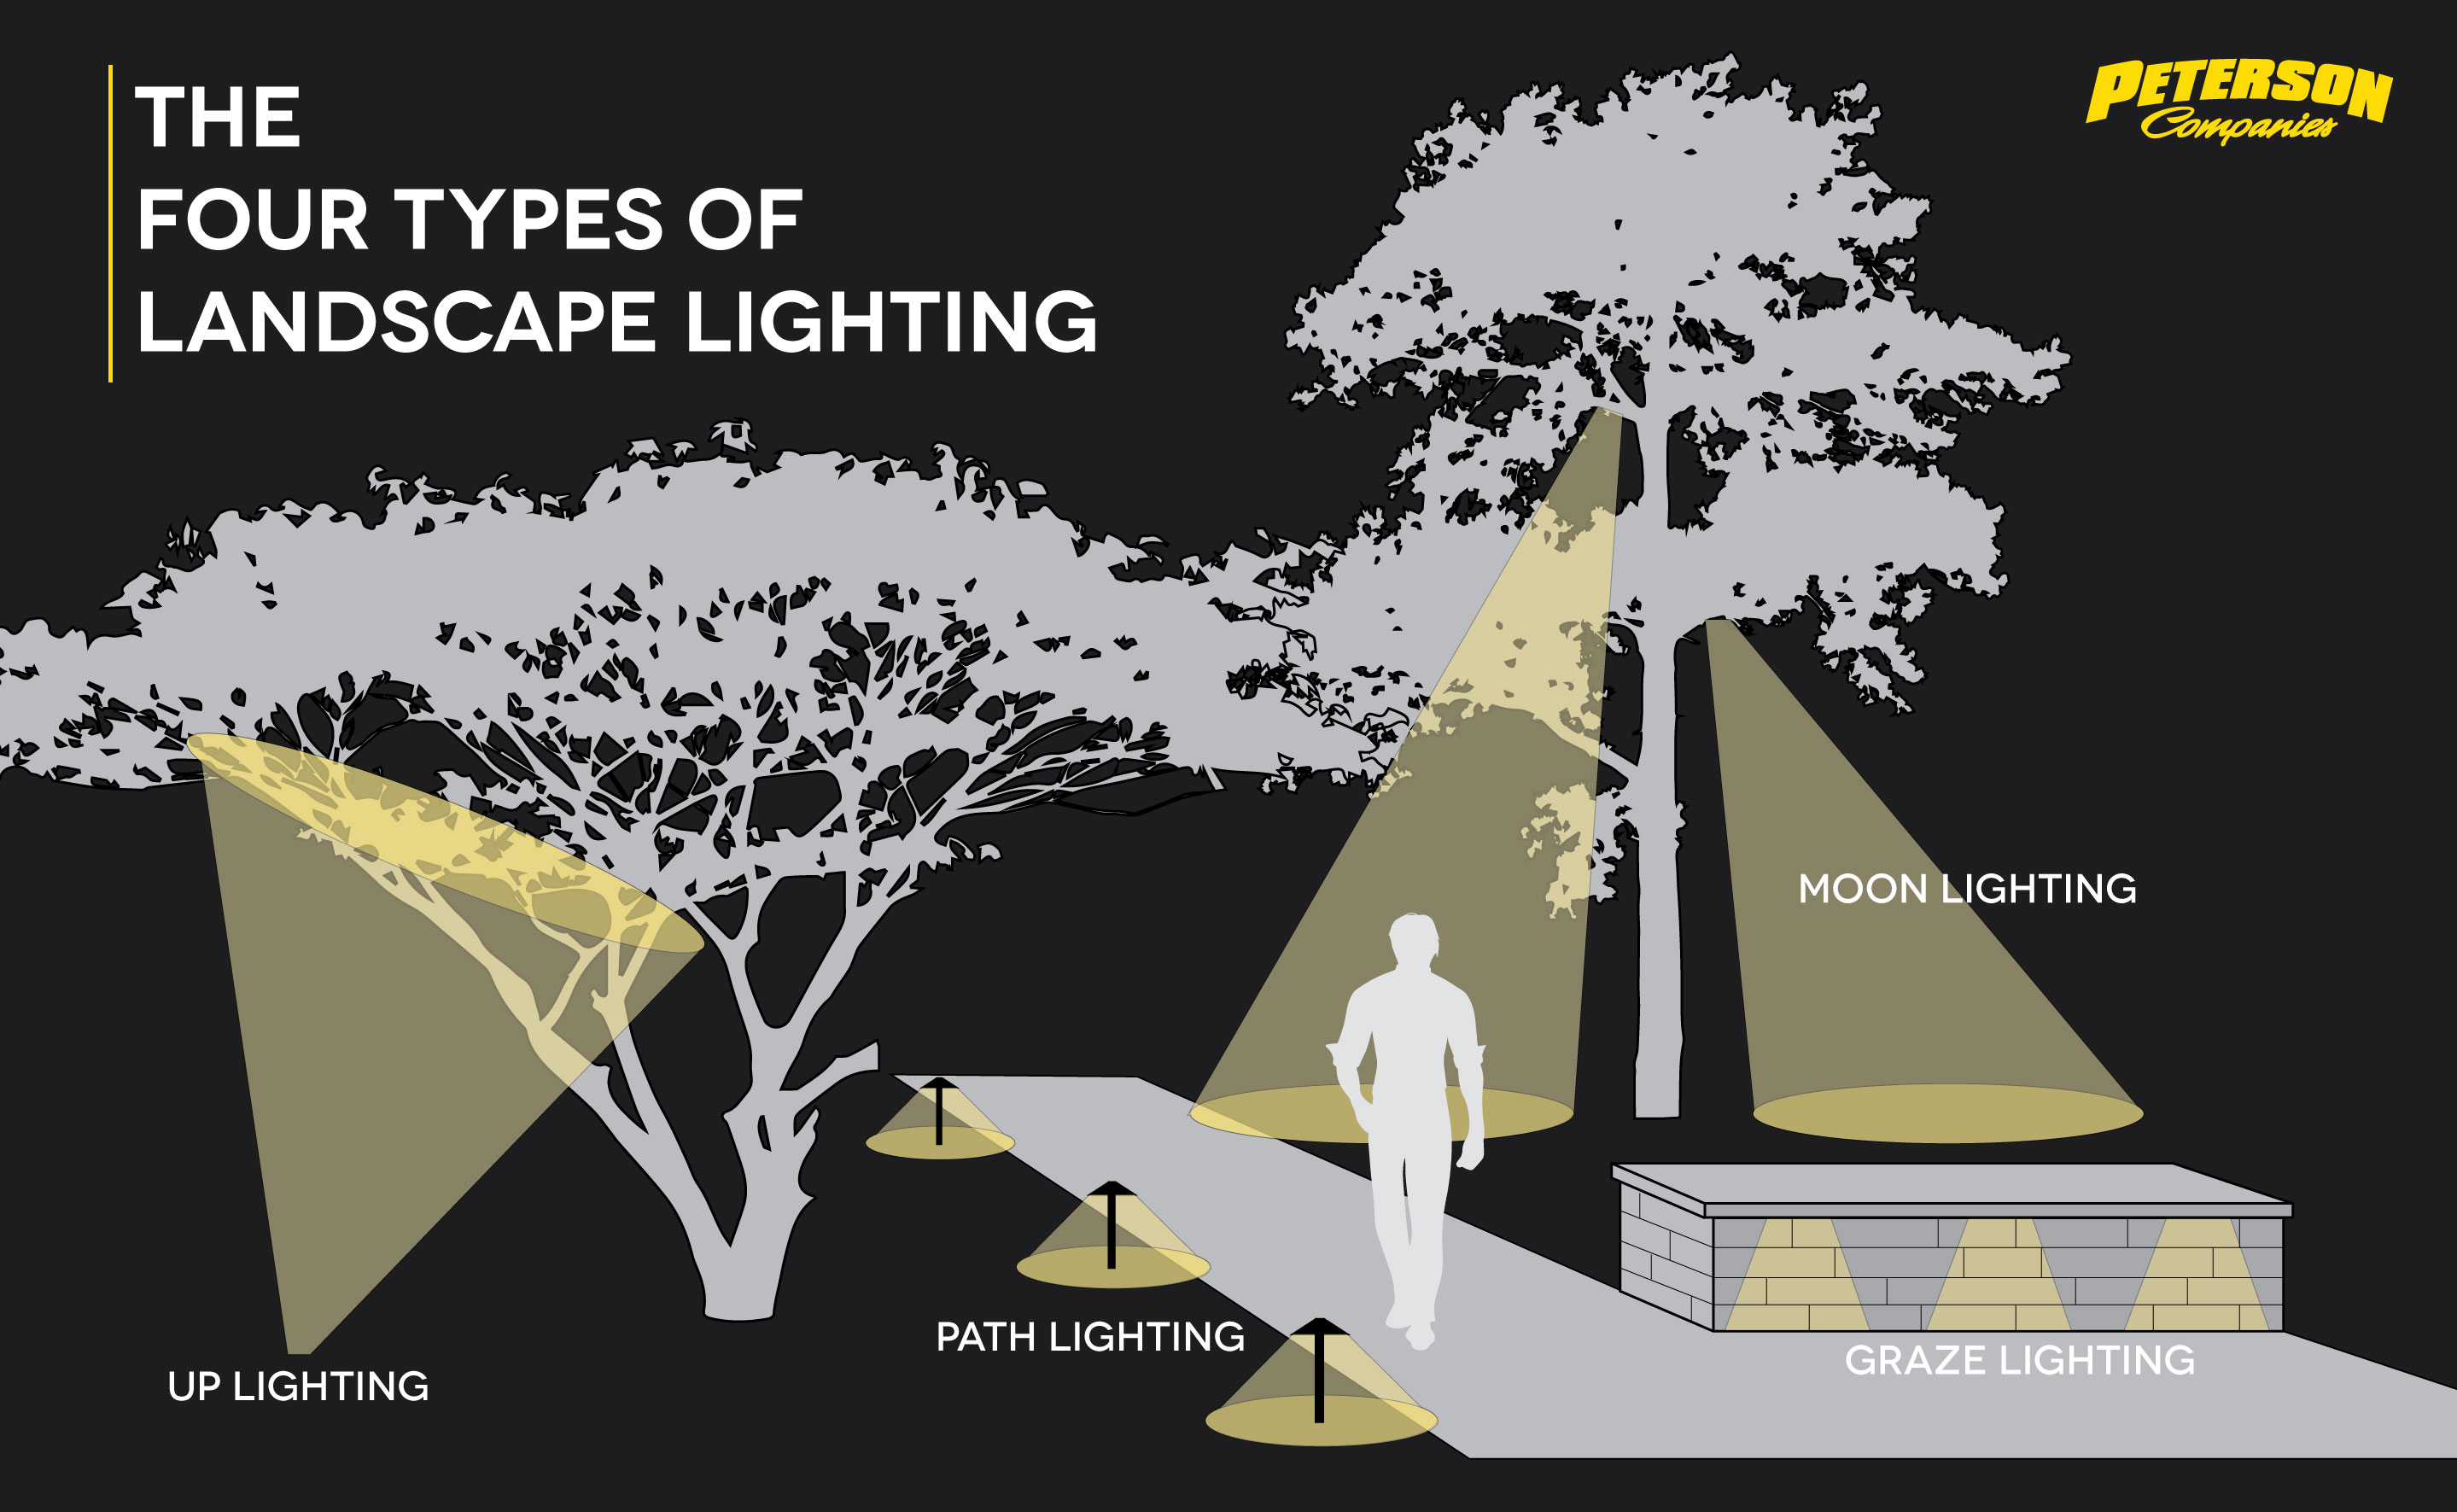 Four Types of Landscape Lighting